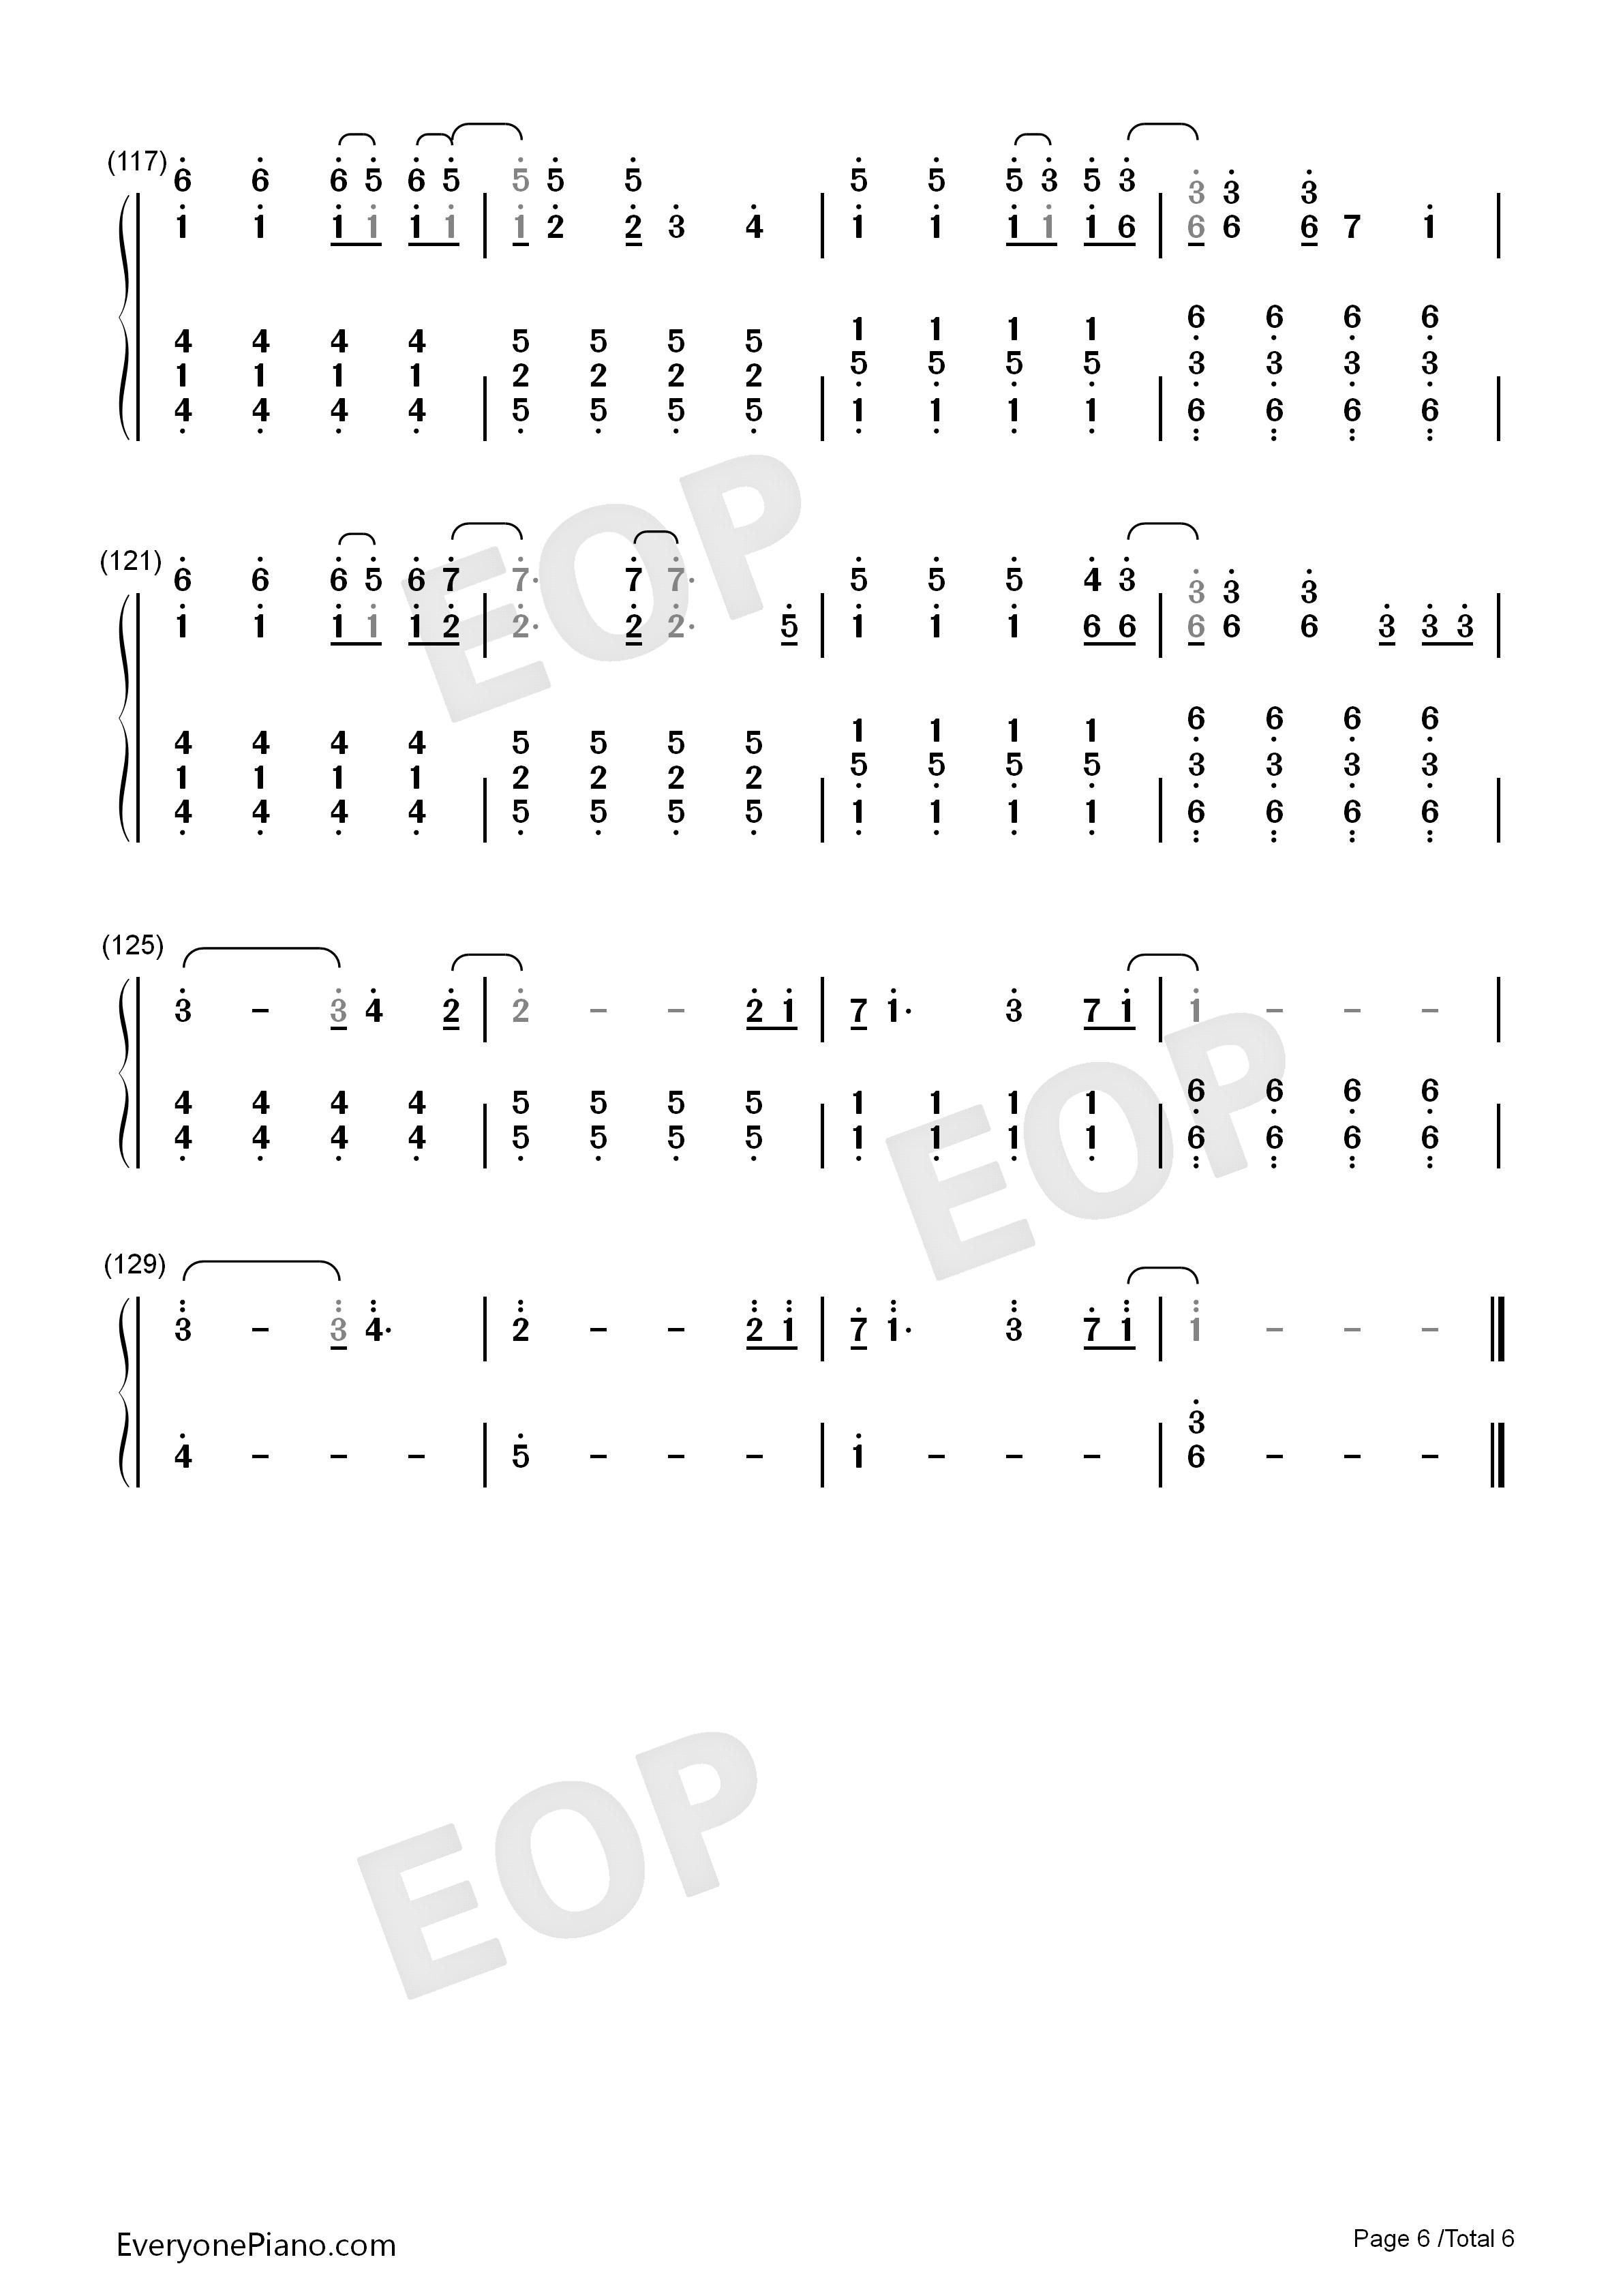 Viva la vida numbered musical notation preview 6 free piano sheet listen now print sheet viva la vida numbered musical notation preview 6 hexwebz Choice Image